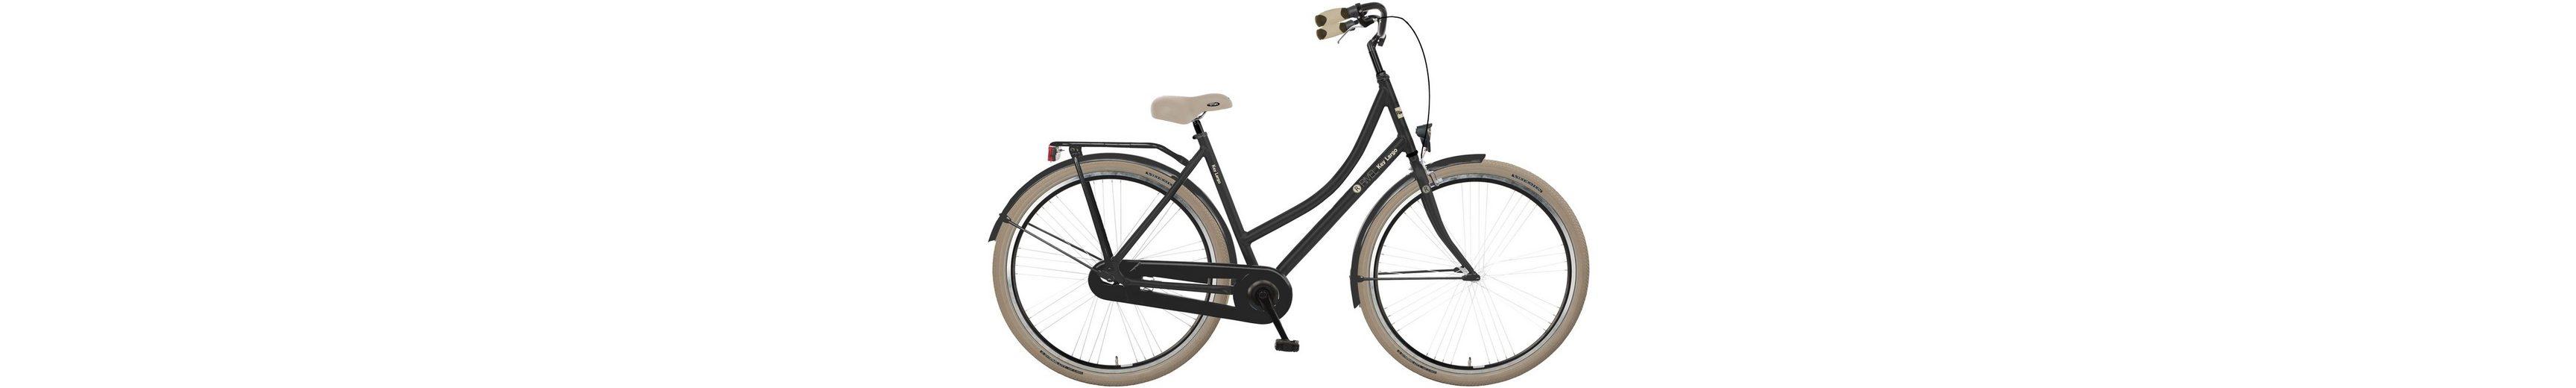 Rivel Damen Citybike, 28 Zoll, Singlespeed, Rücktritt, »Key Largo«